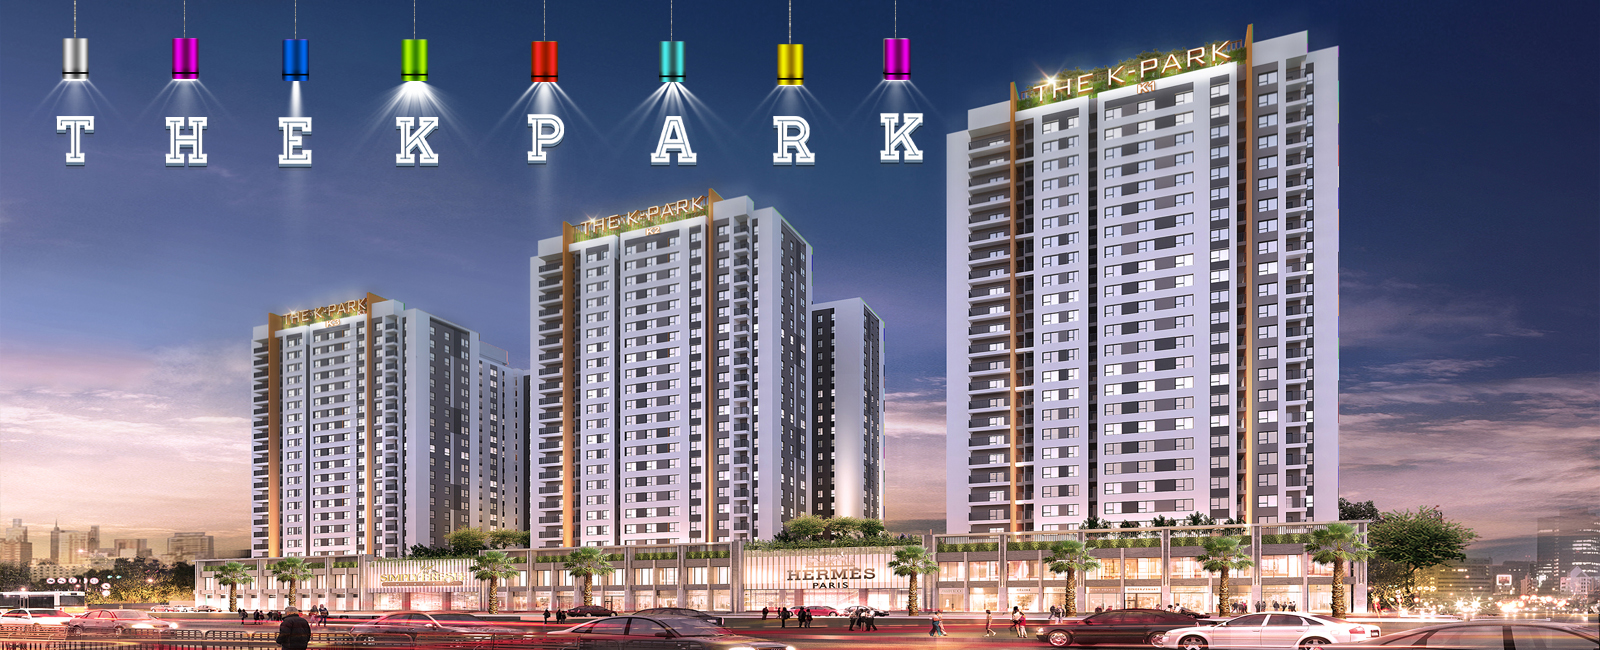 slider_bg_plane_Chung cư The K Park Văn Phú